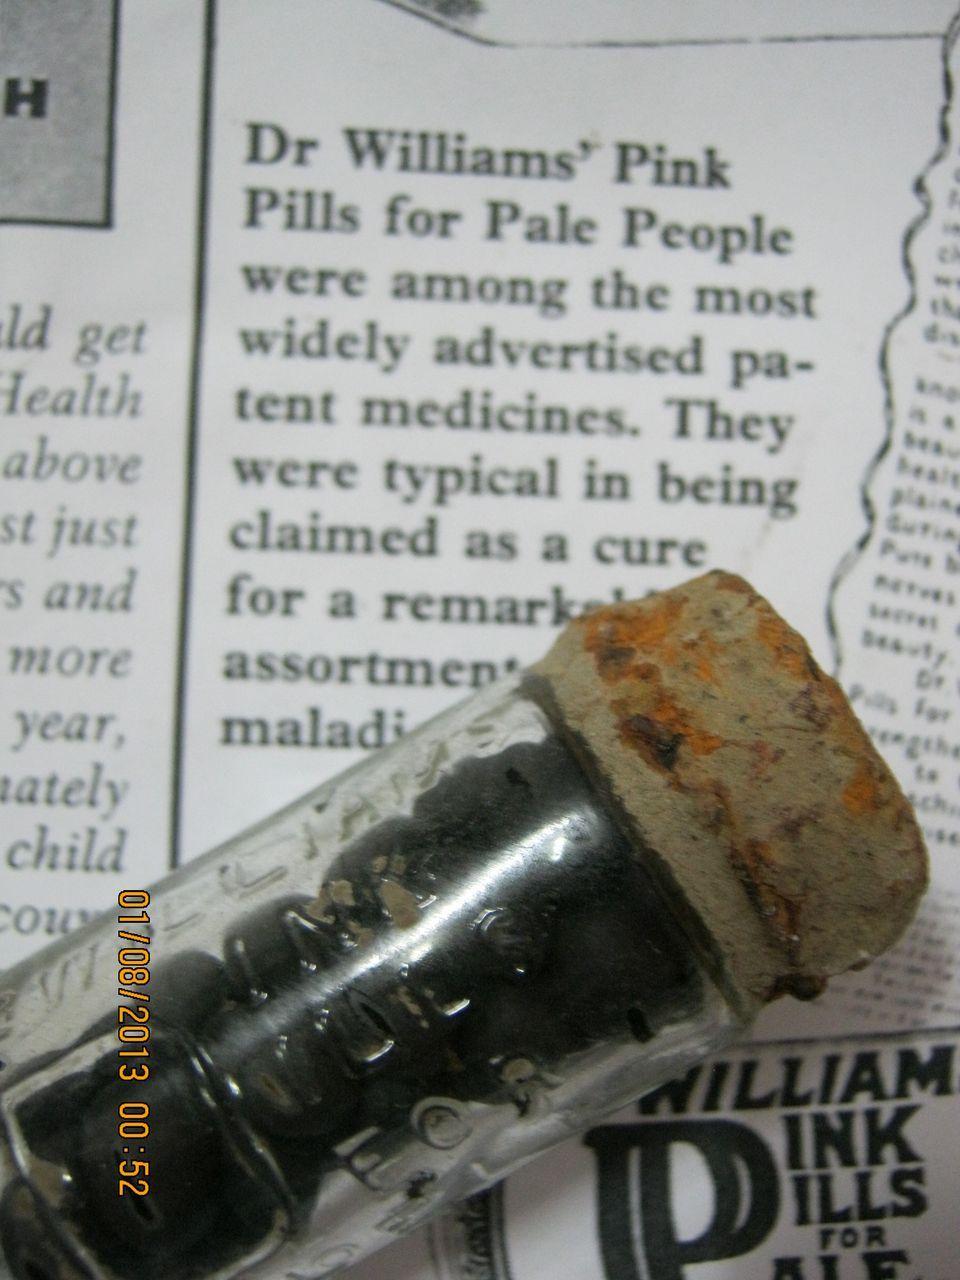 Dr. Williams Pink Pills For Pale People - Original Full Vial - Circa 1900